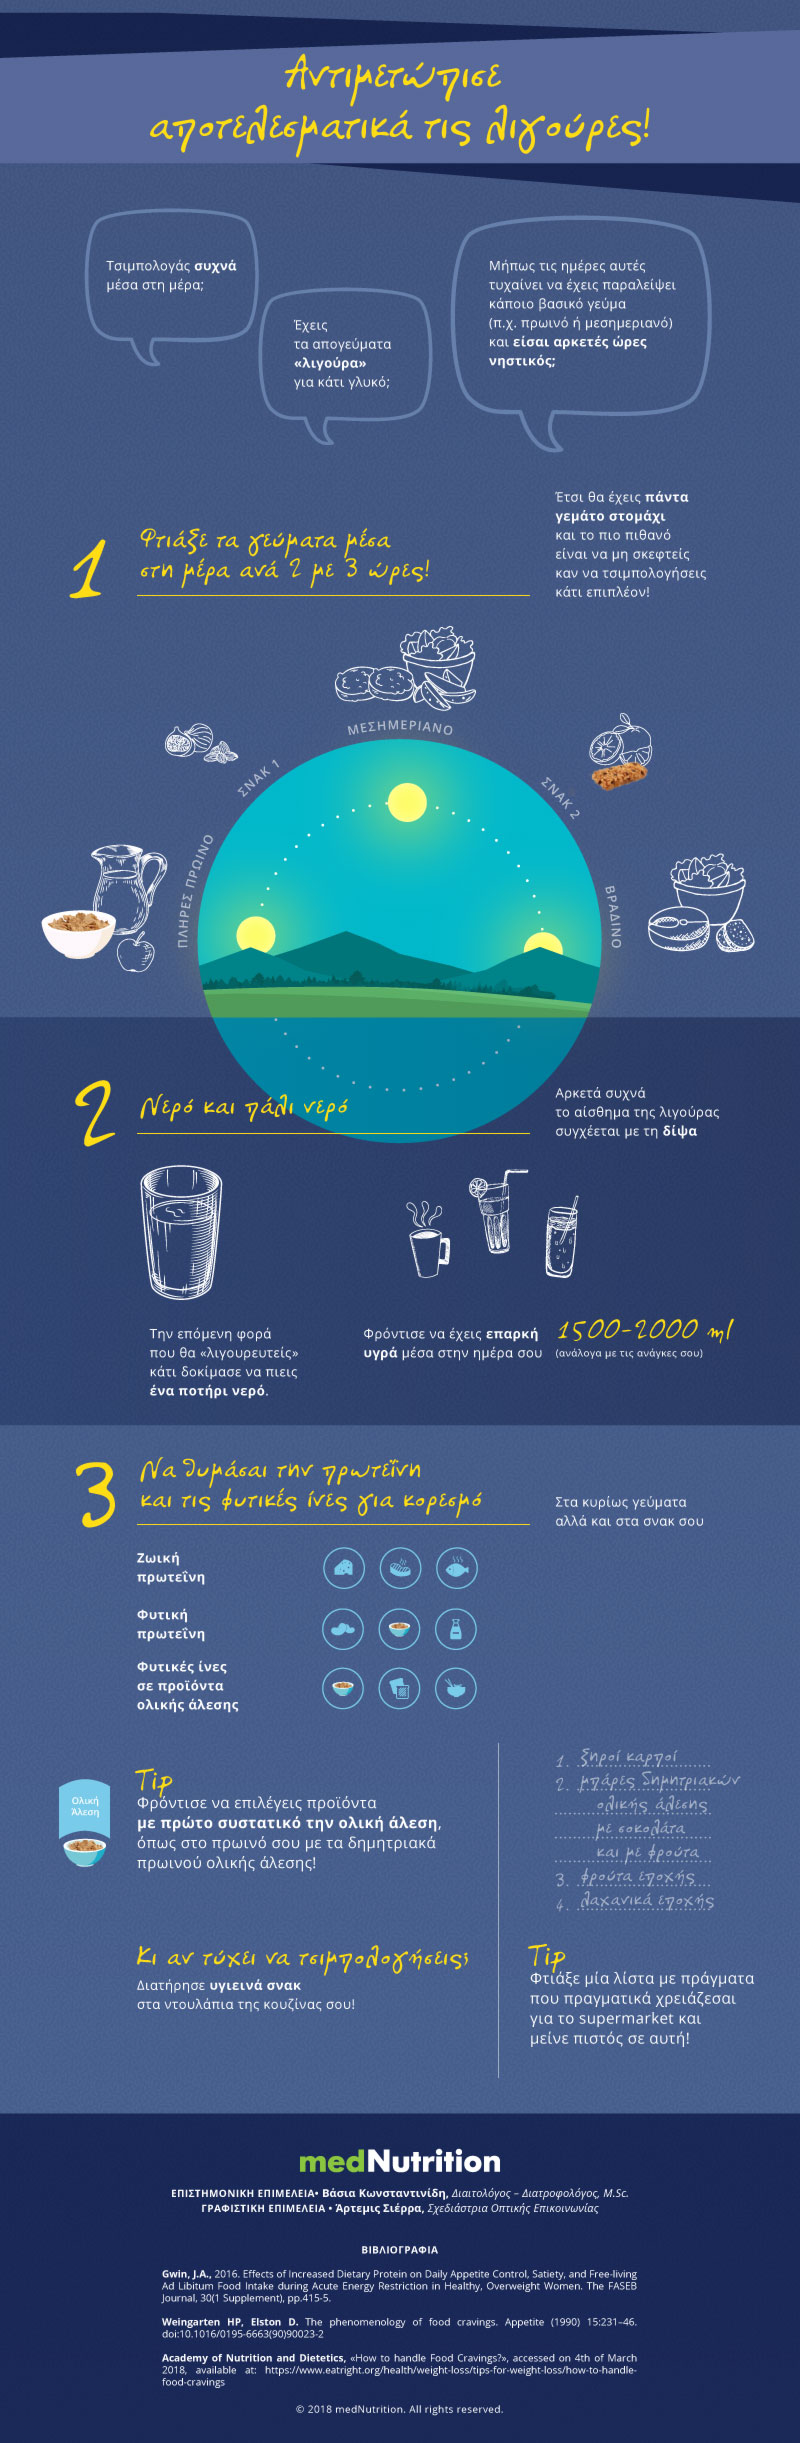 Infographic ligoures fitness fin